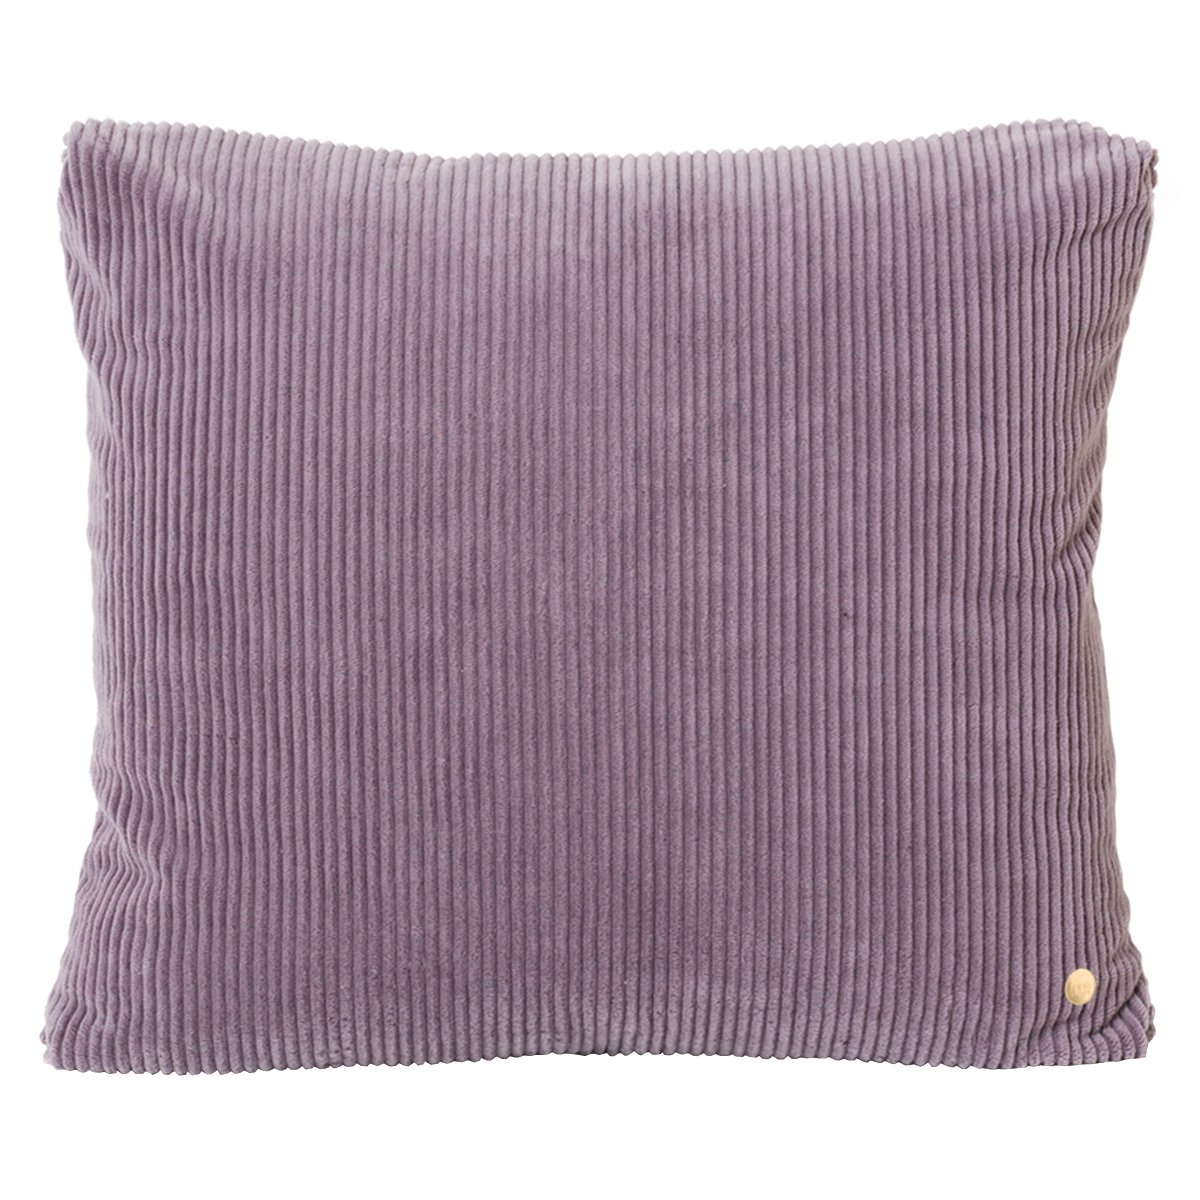 Ferm Living Corduroy Kussen - Lavender